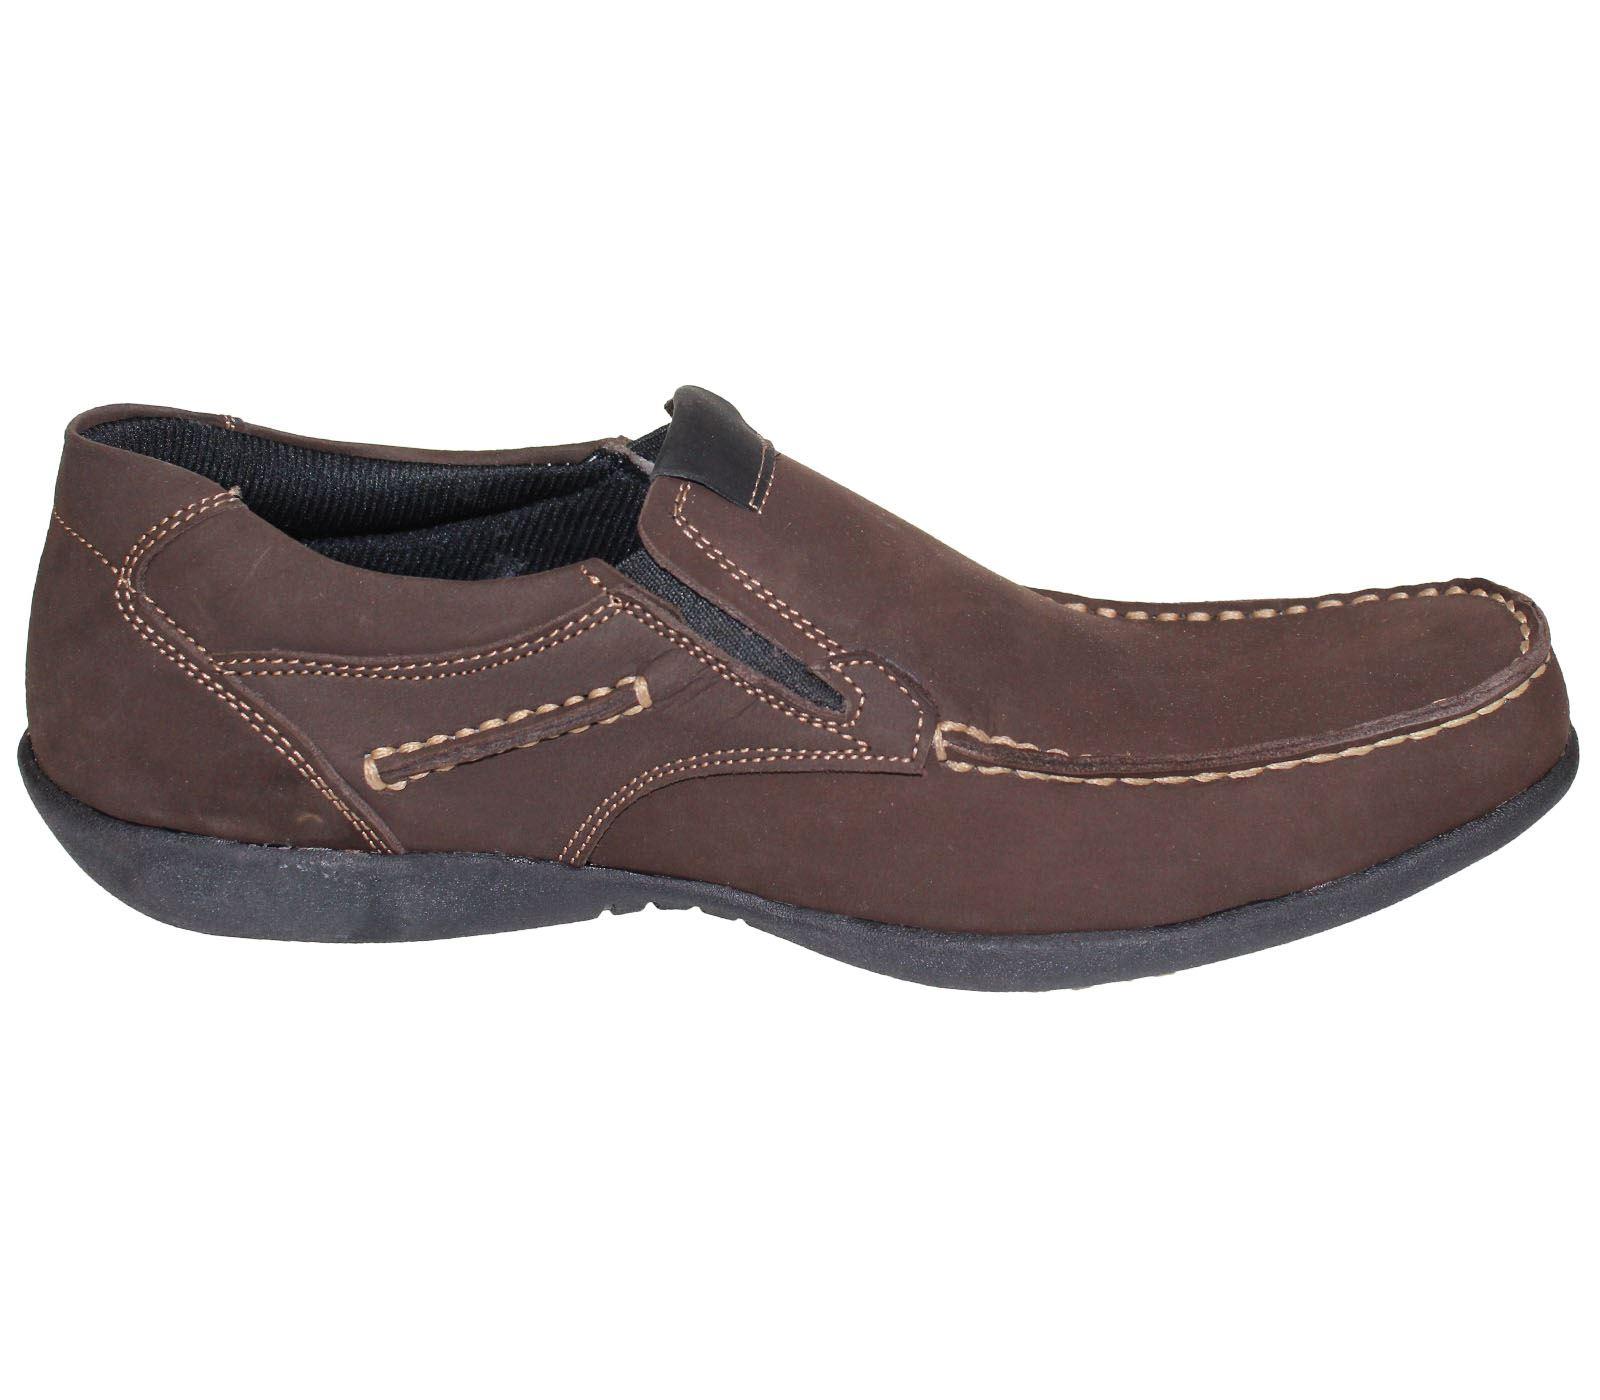 mens slip on shoes casual moccasins loafer walking comfort